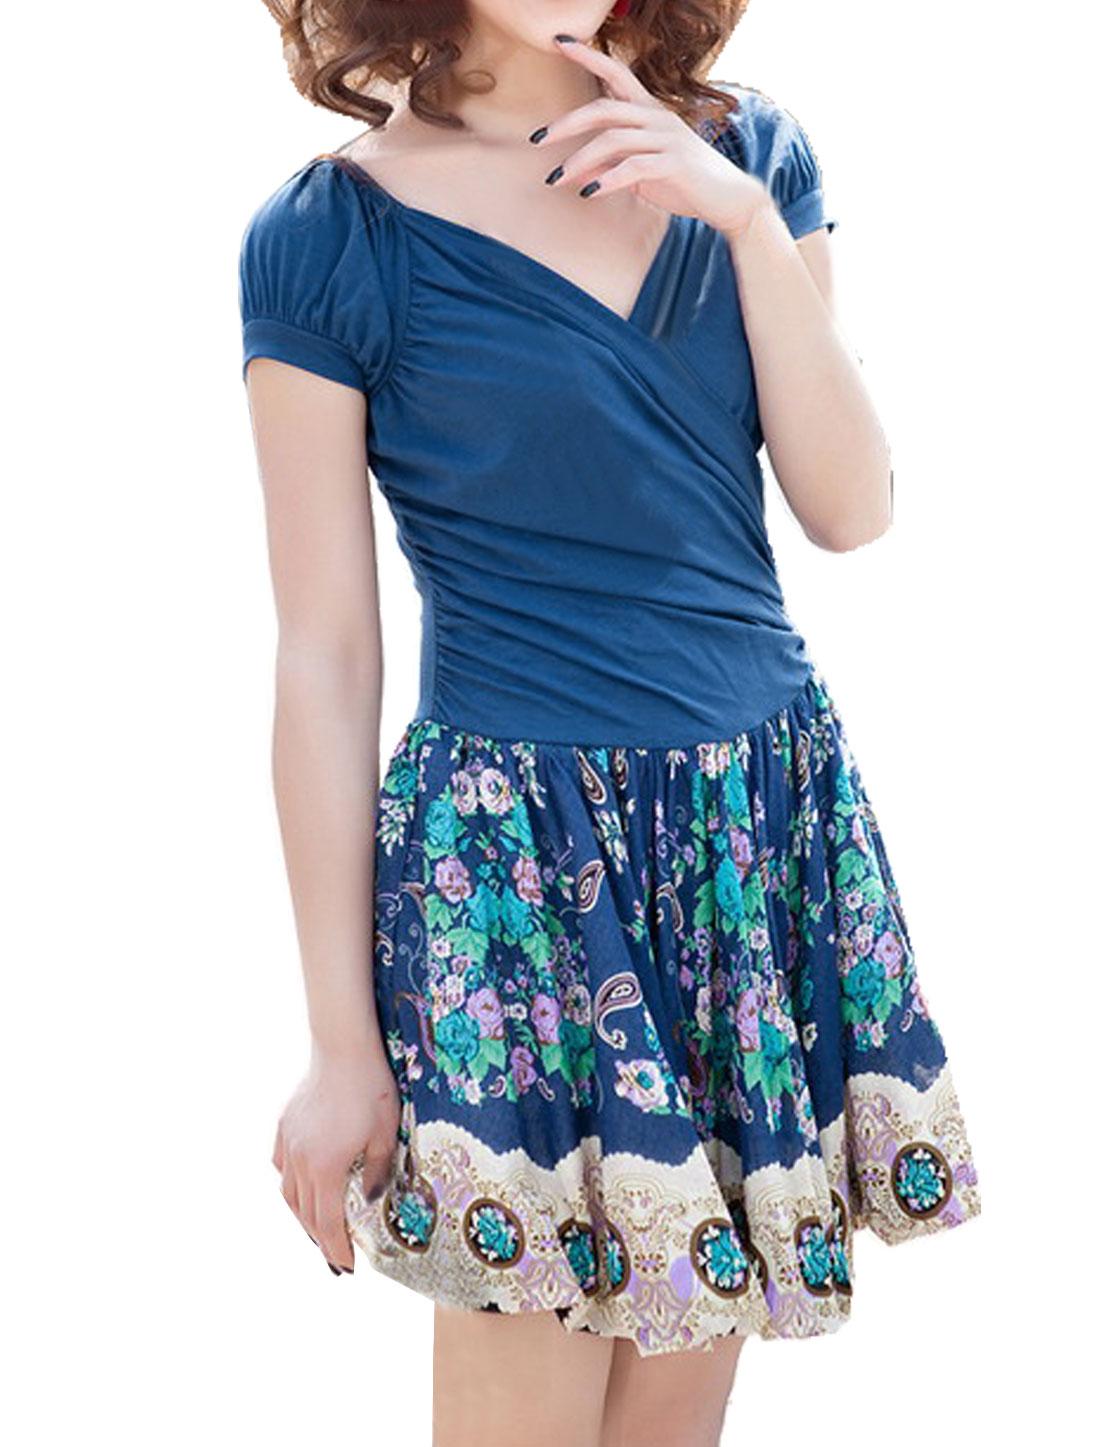 Women Crossover V Neck Floral Paisleys Prints Dress Blue XS